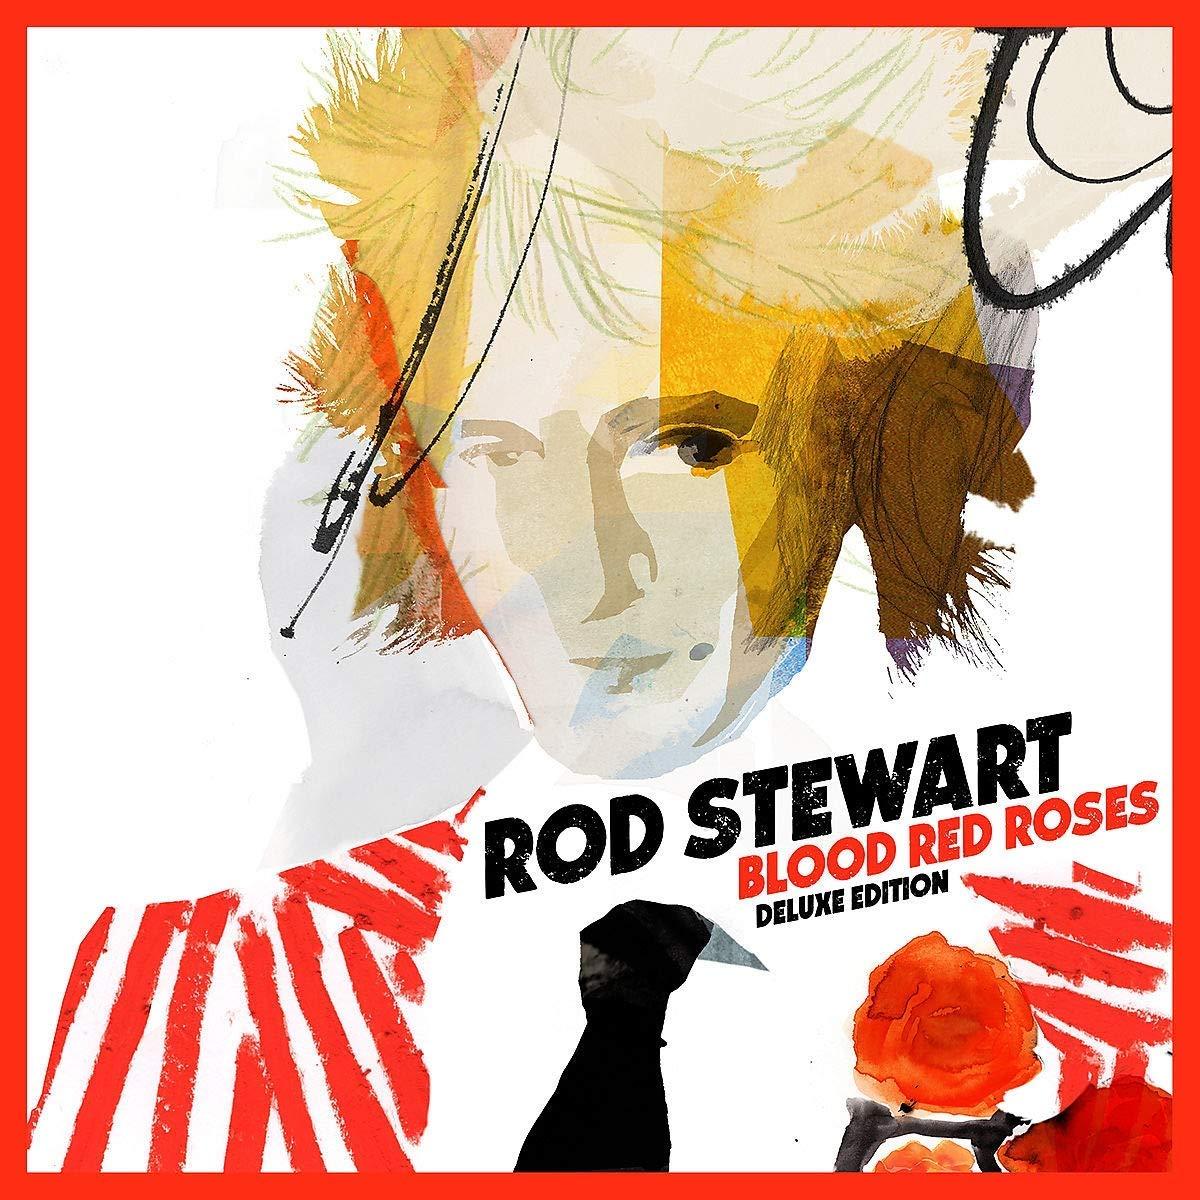 Rod Stewart New Lp Blood Red Roses Tour Listen Best Classic Bands